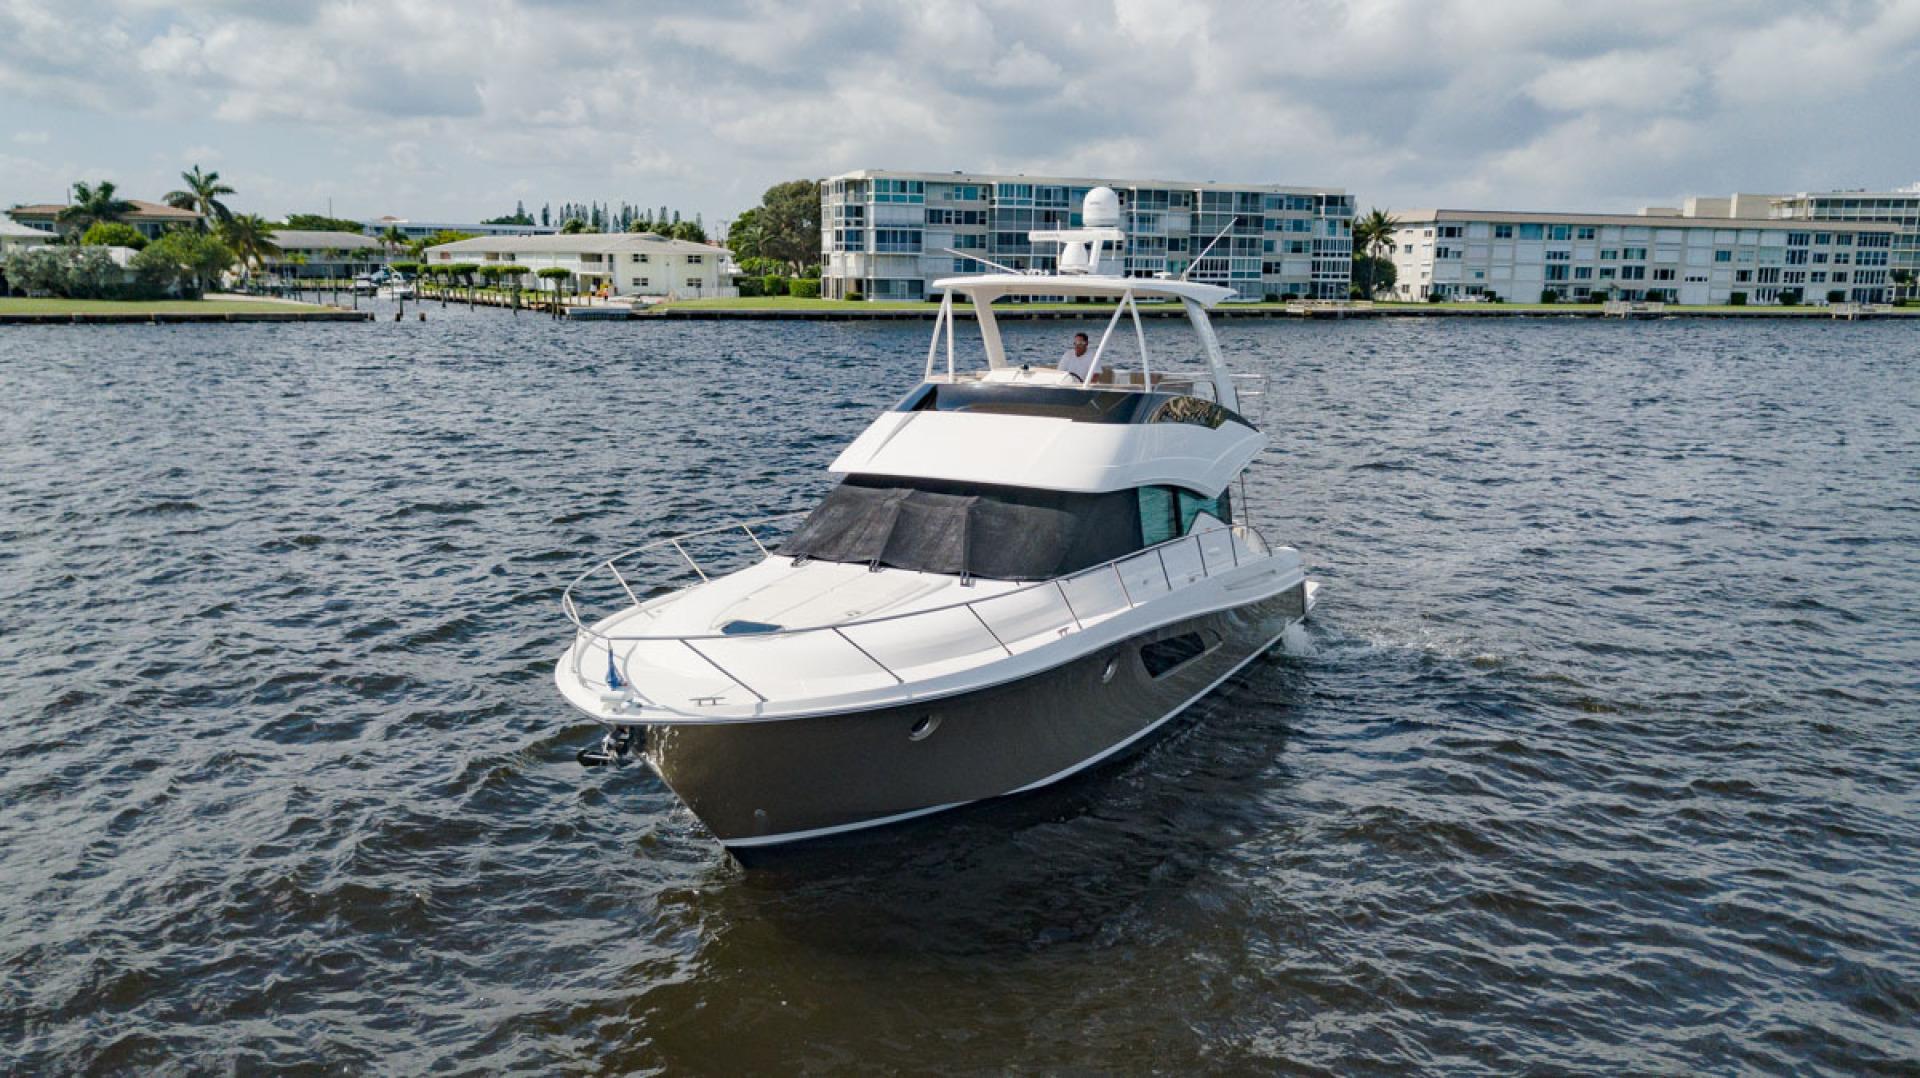 Tiara Yachts-50 Flybridge 2015-Khatch You Later North Palm Beach-Florida-United States-Khatch You Later-1509528 | Thumbnail